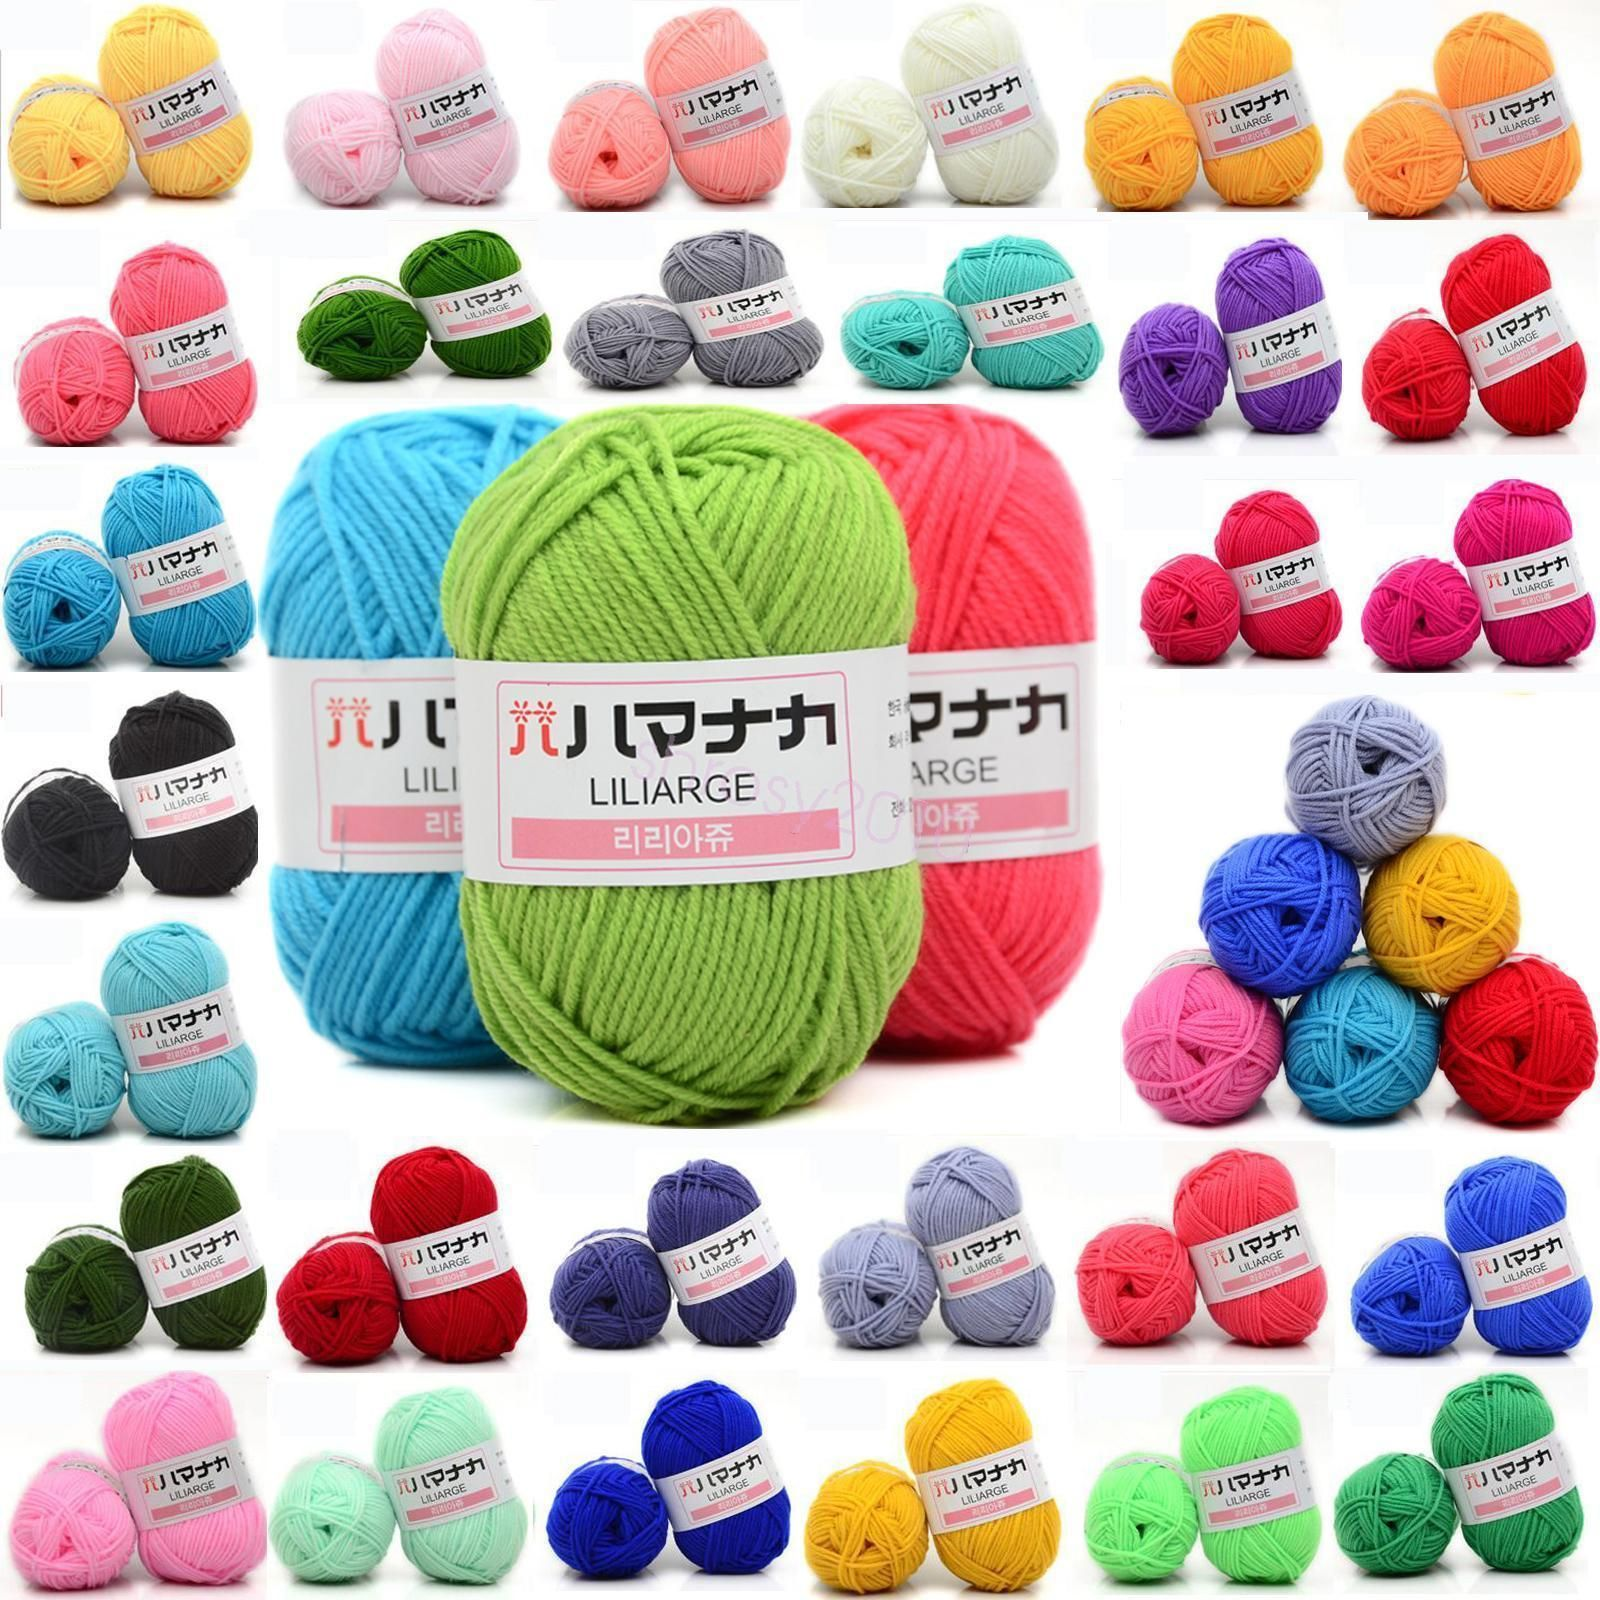 CHIC 42 colors Crochet Soft Bamboo Cotton Knitting Yarn Baby Natural Wool Yarn Y